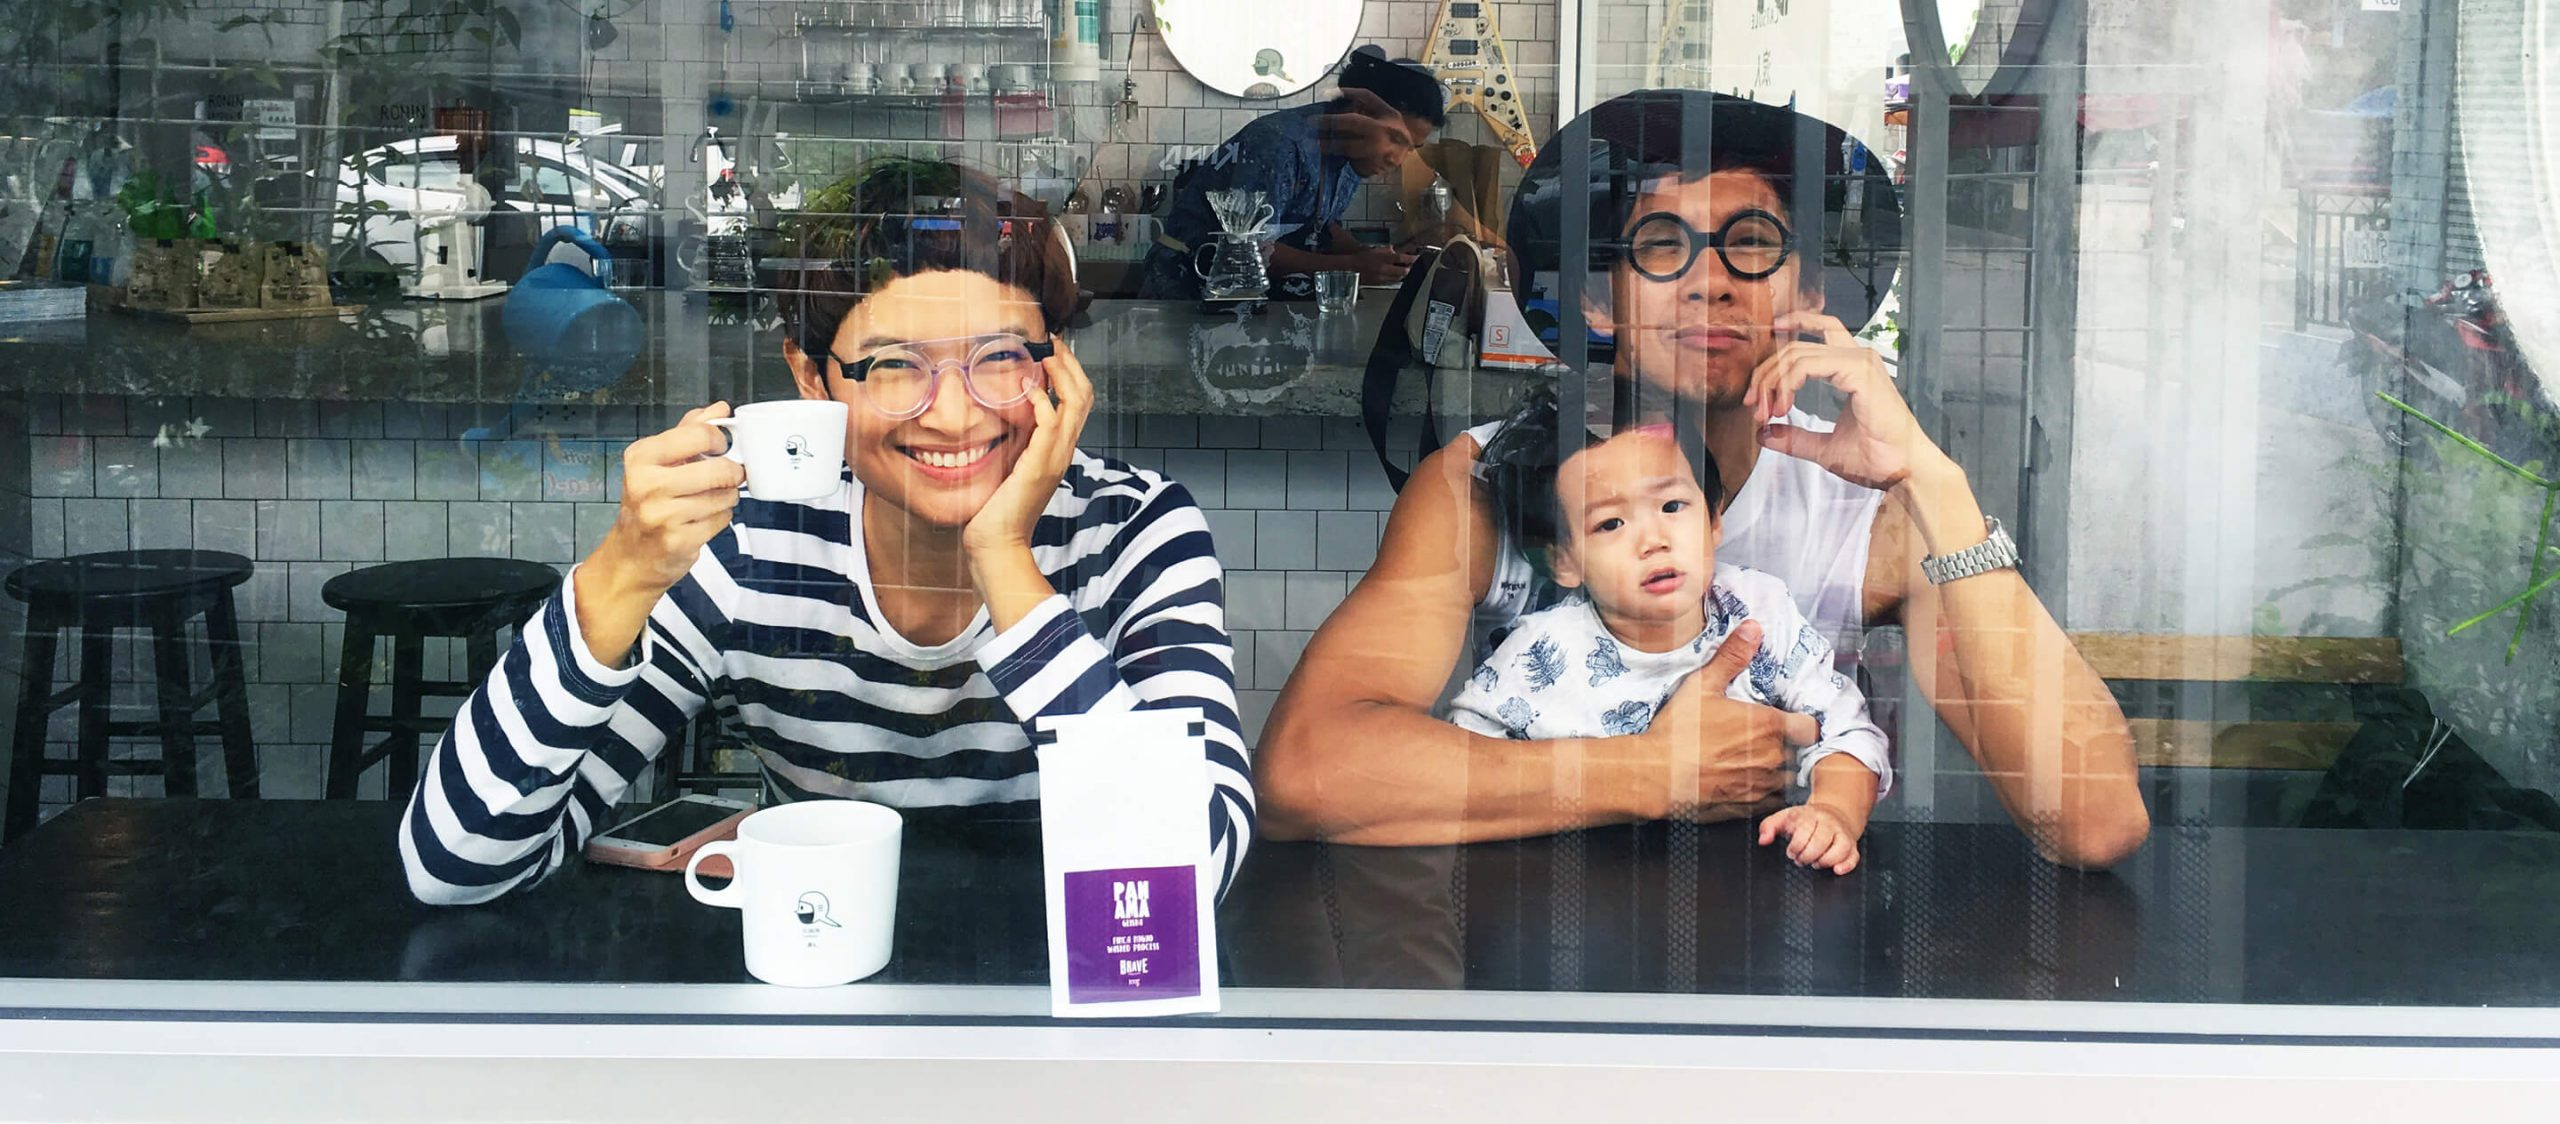 Ronin Capsule บ้านอบอุ่นของครอบครัวศิลปินที่รอให้ 'เพื่อน' มากินกาแฟด้วยกัน